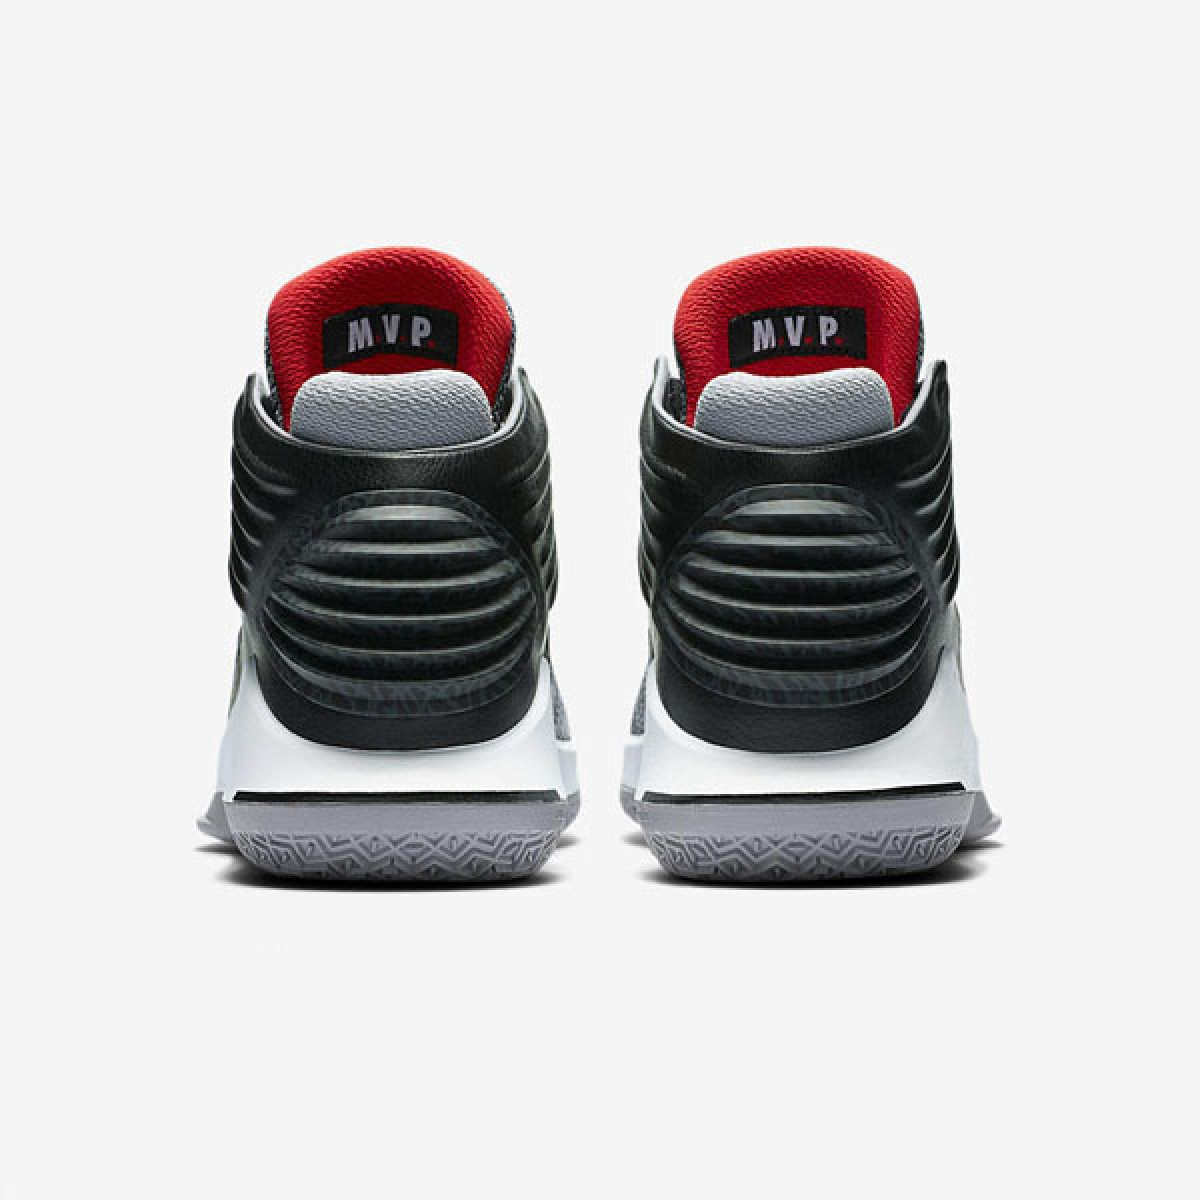 87c1fba0b756 Buy Air Jordan XXX2  Cement  Basketball shoes   sneakers